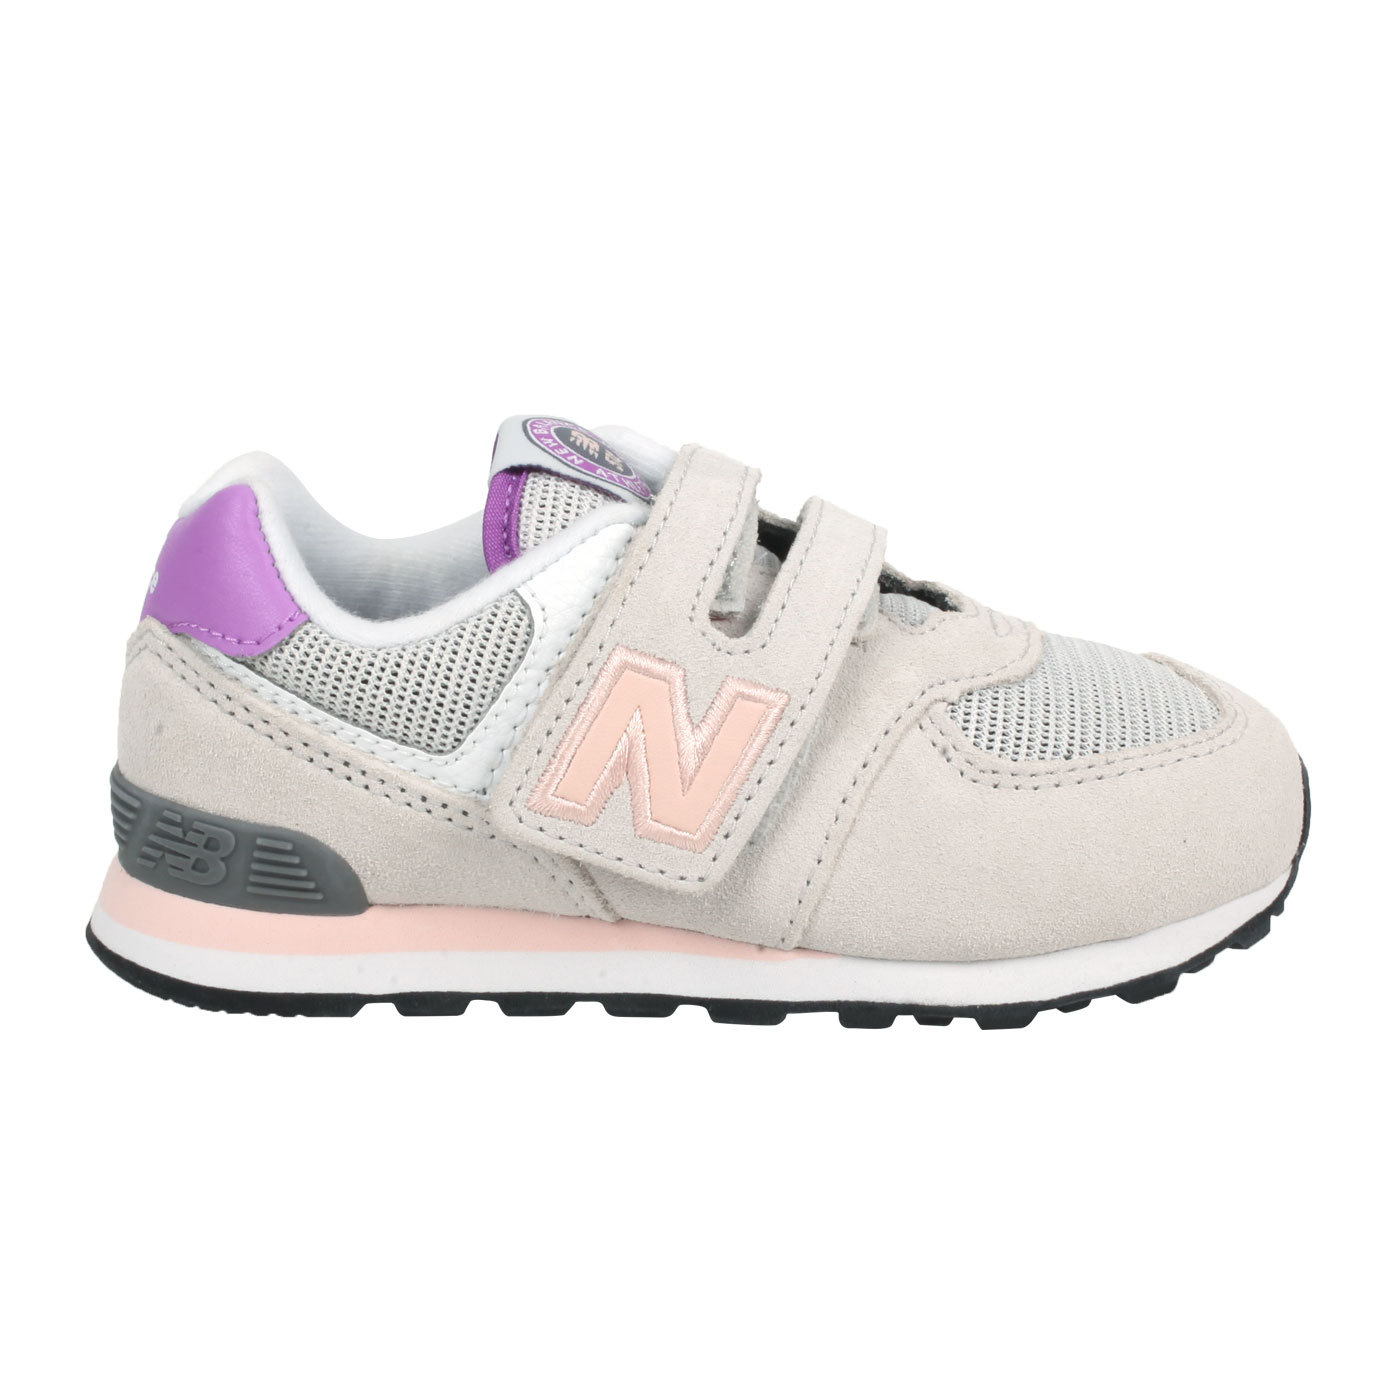 NEW BALANCE 小童休閒運動鞋-WIDE IV574HZ1